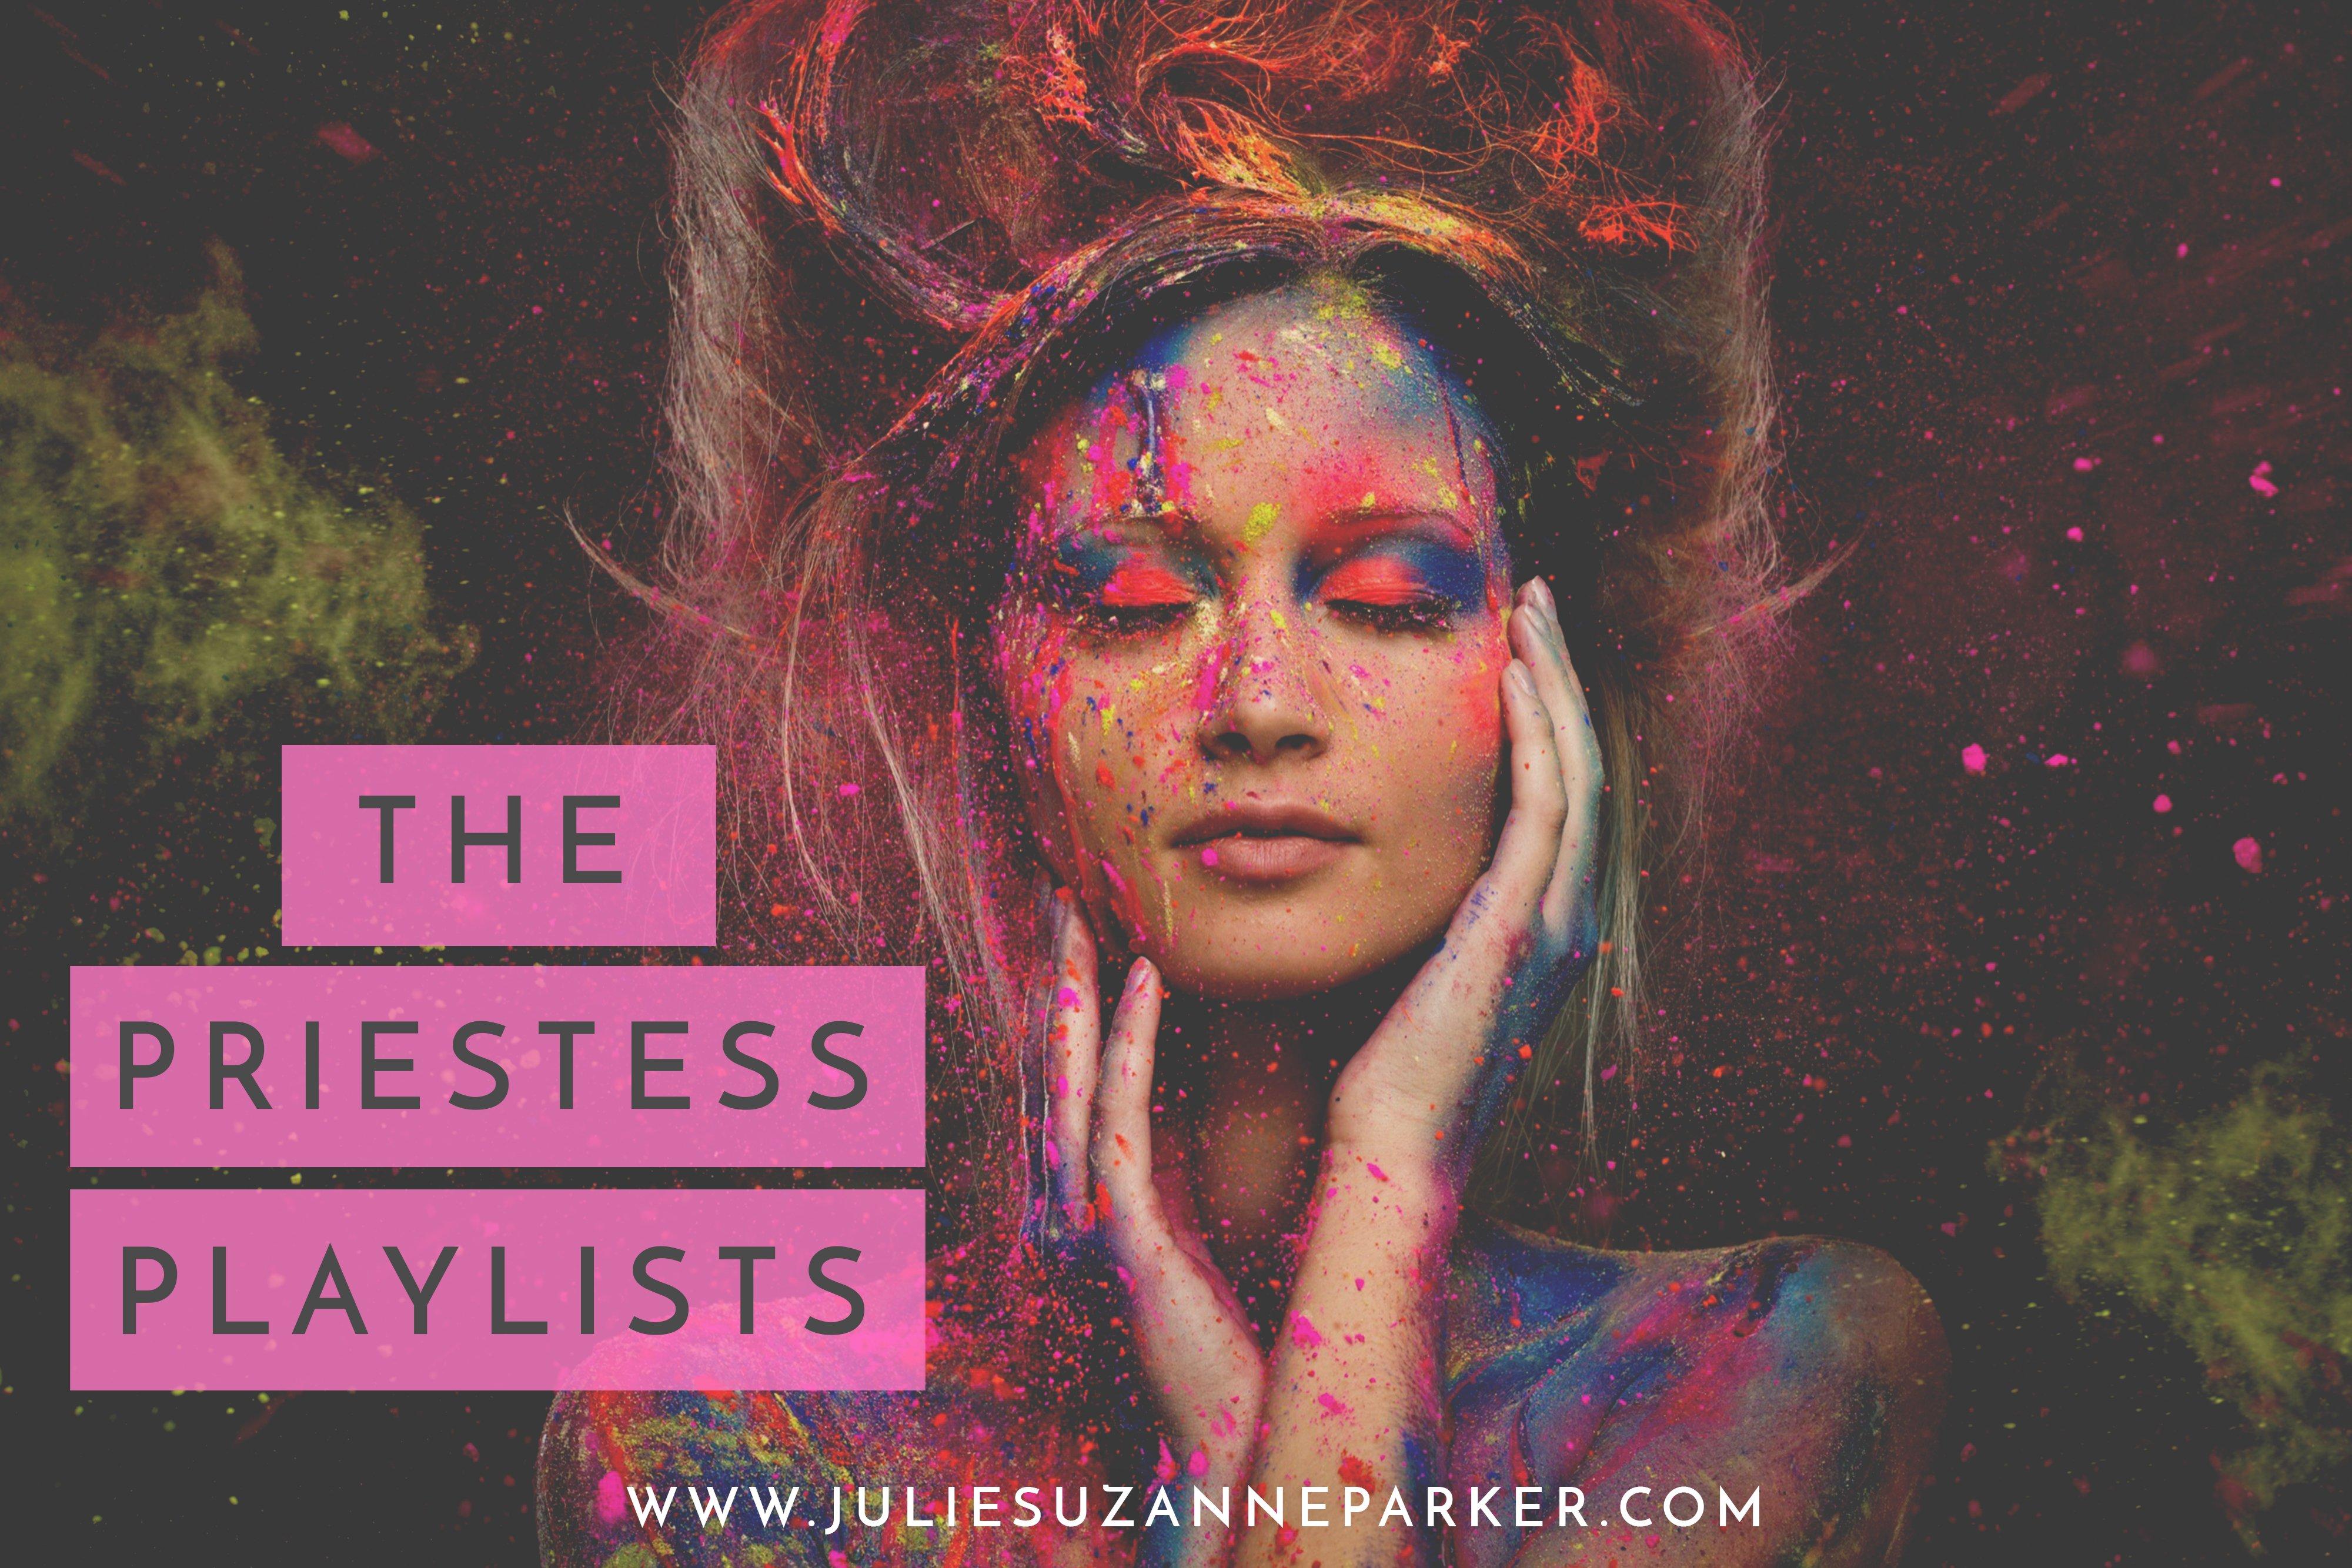 The Priestess Playlists